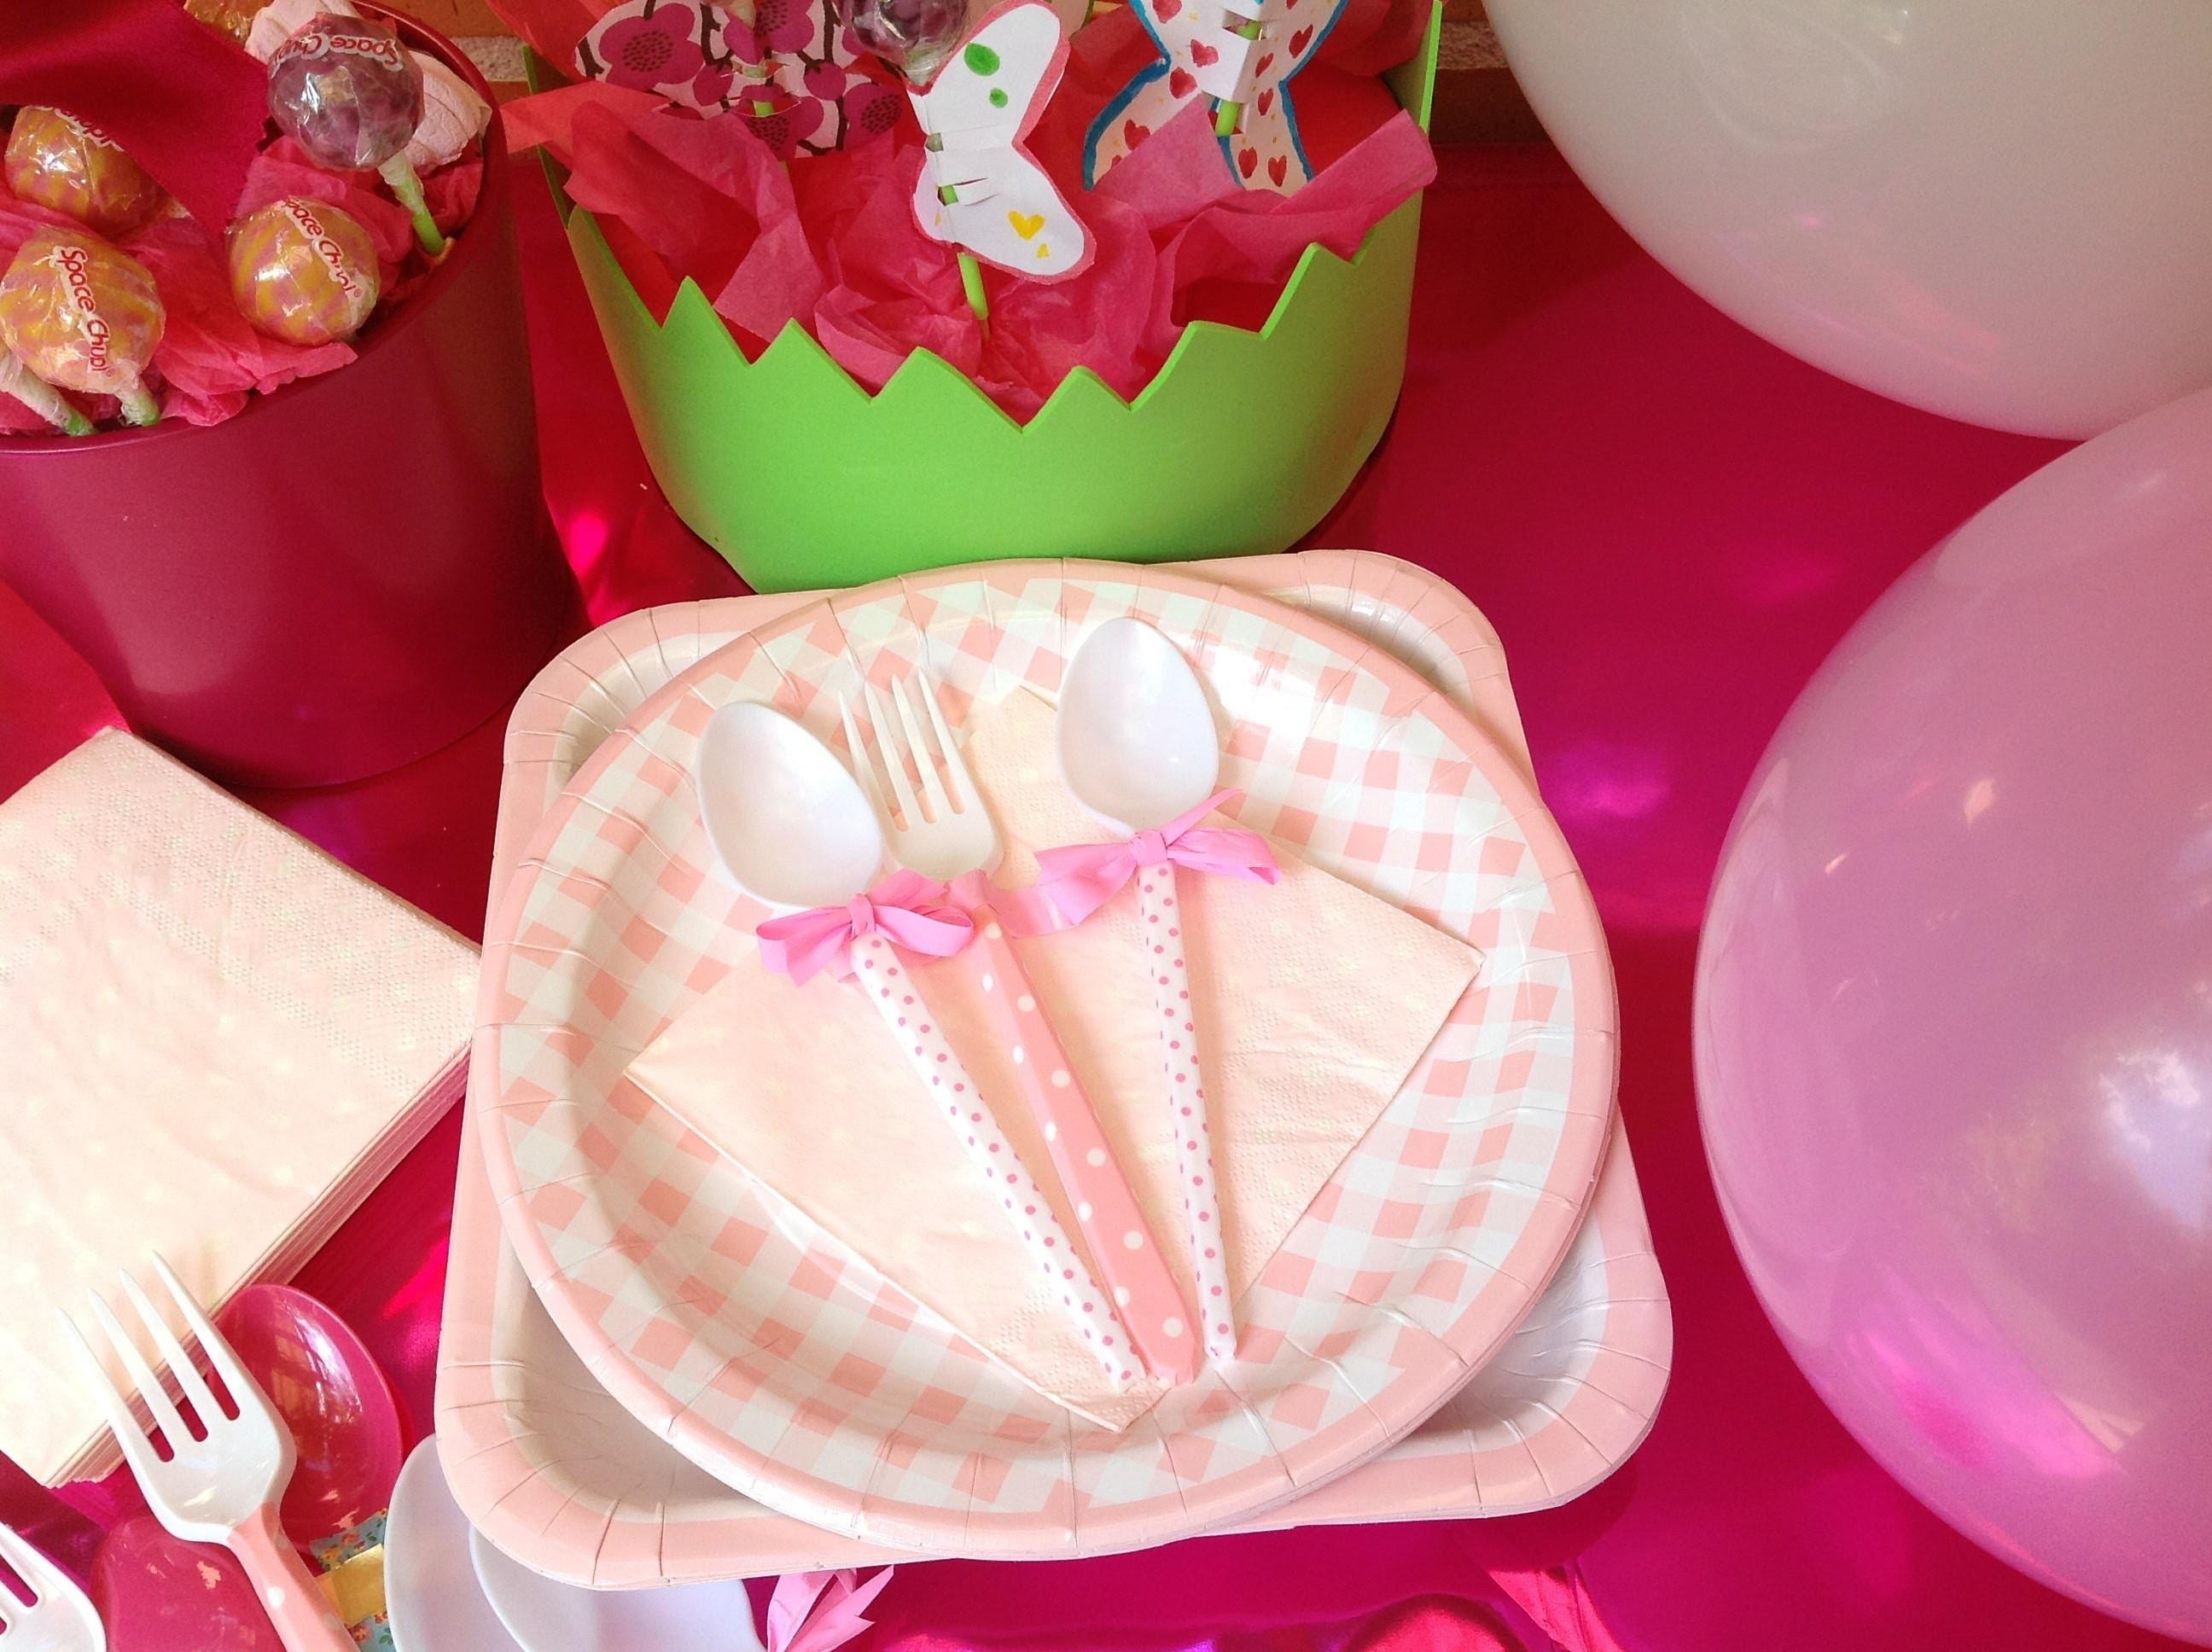 Cucharas Decoradas Para Fiestas Infantiles Washi Tape Spoons - Decorados-para-fiestas